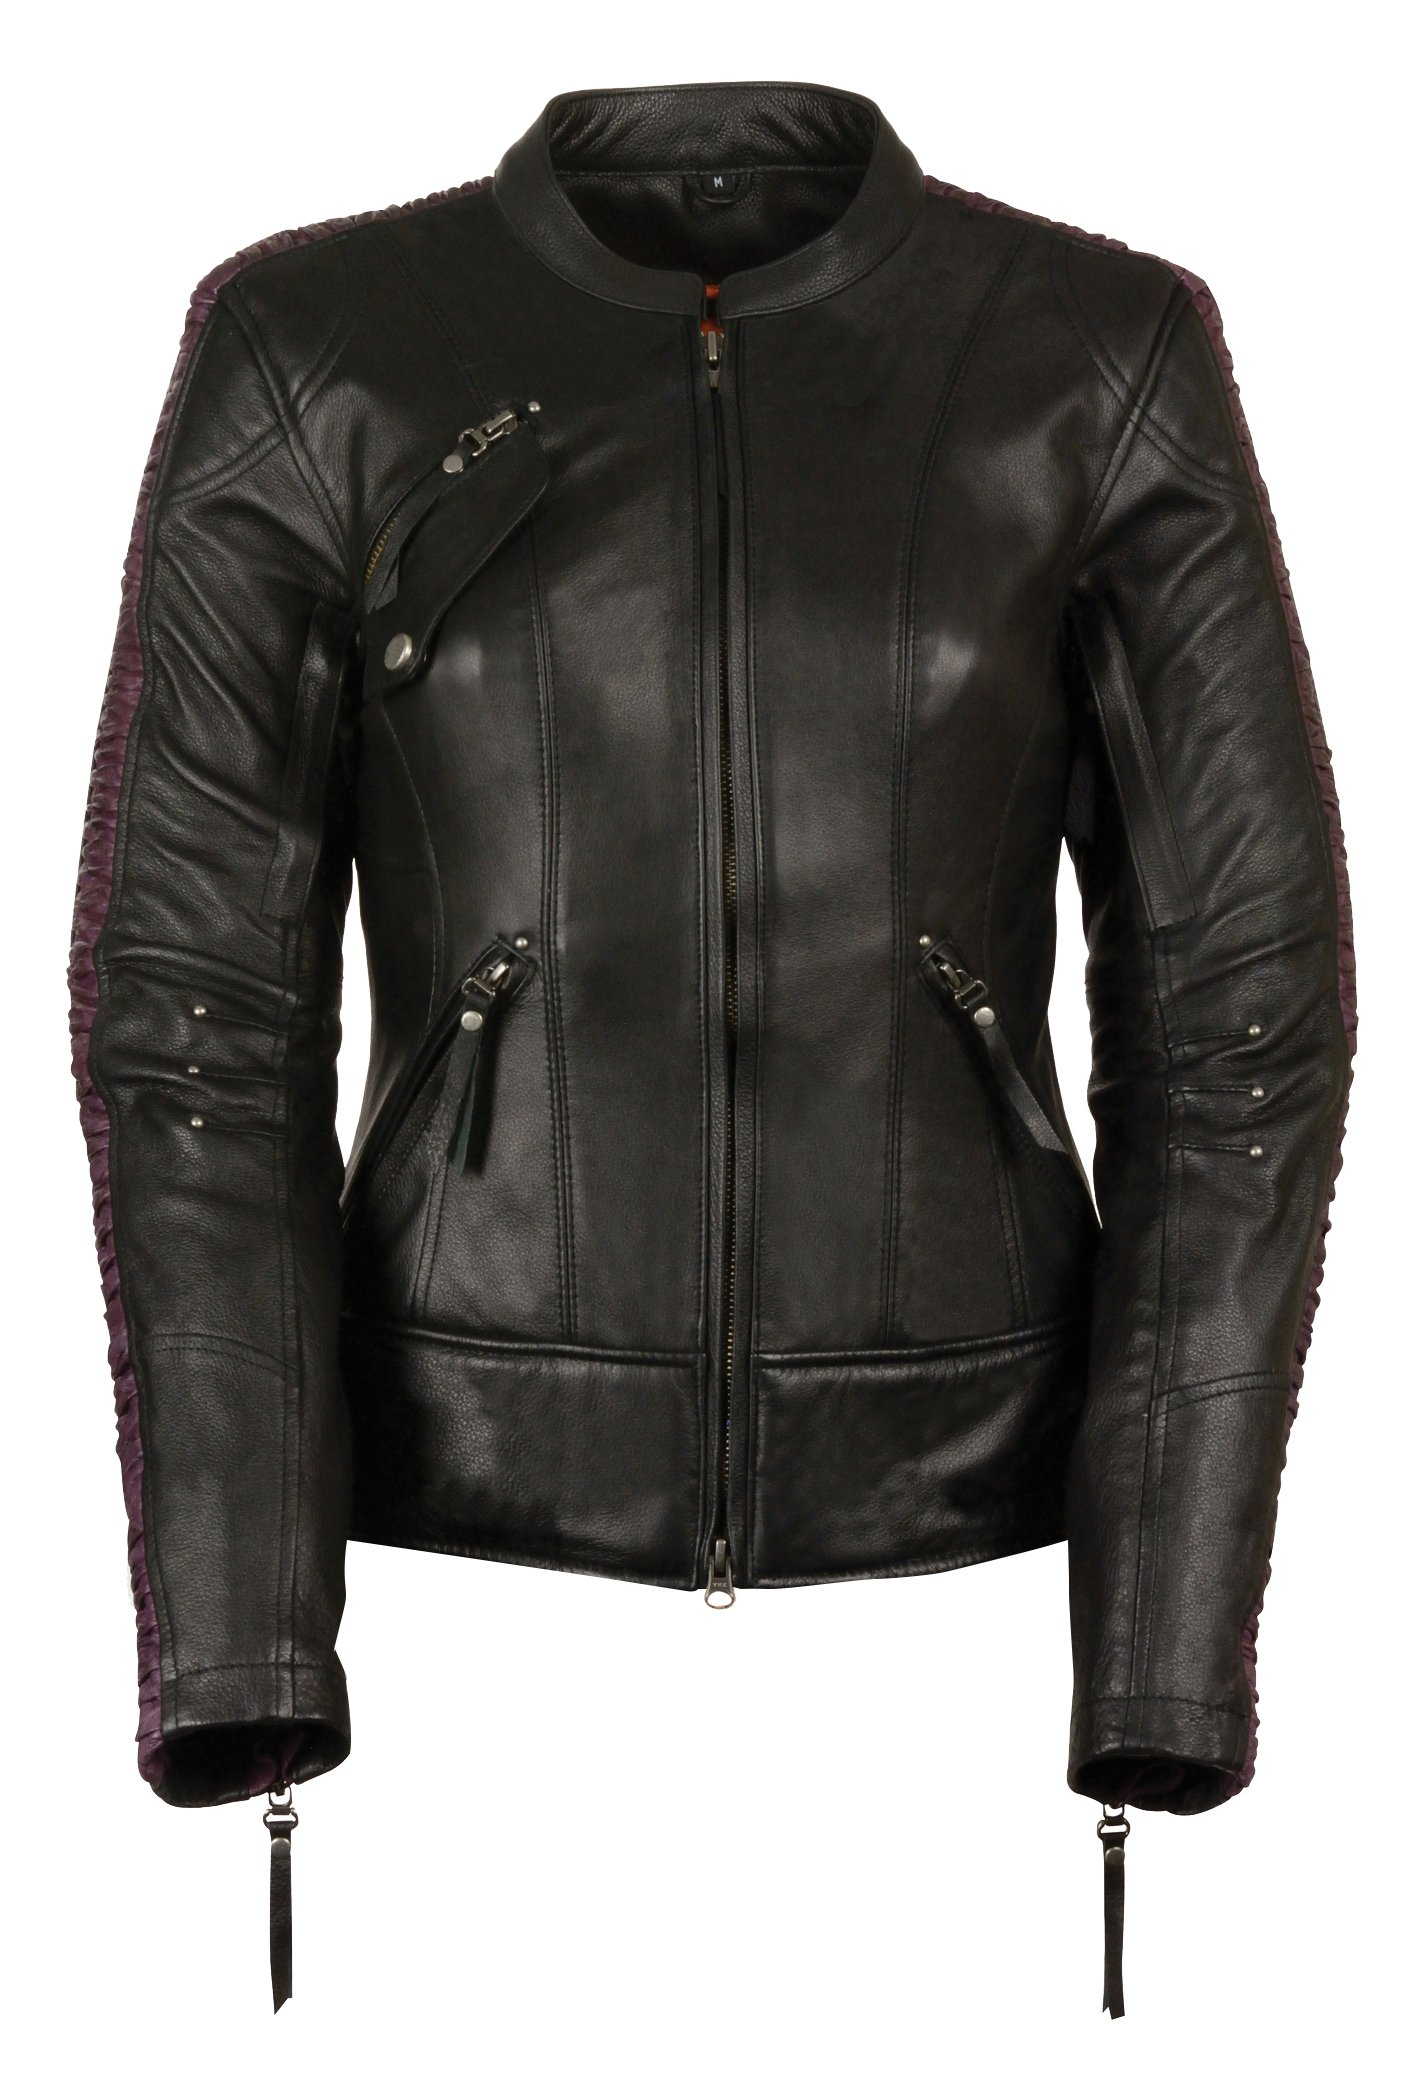 Milwaukee Leather Women's Embossed Phoenix Jacket (Black/Purple, XX-Large)